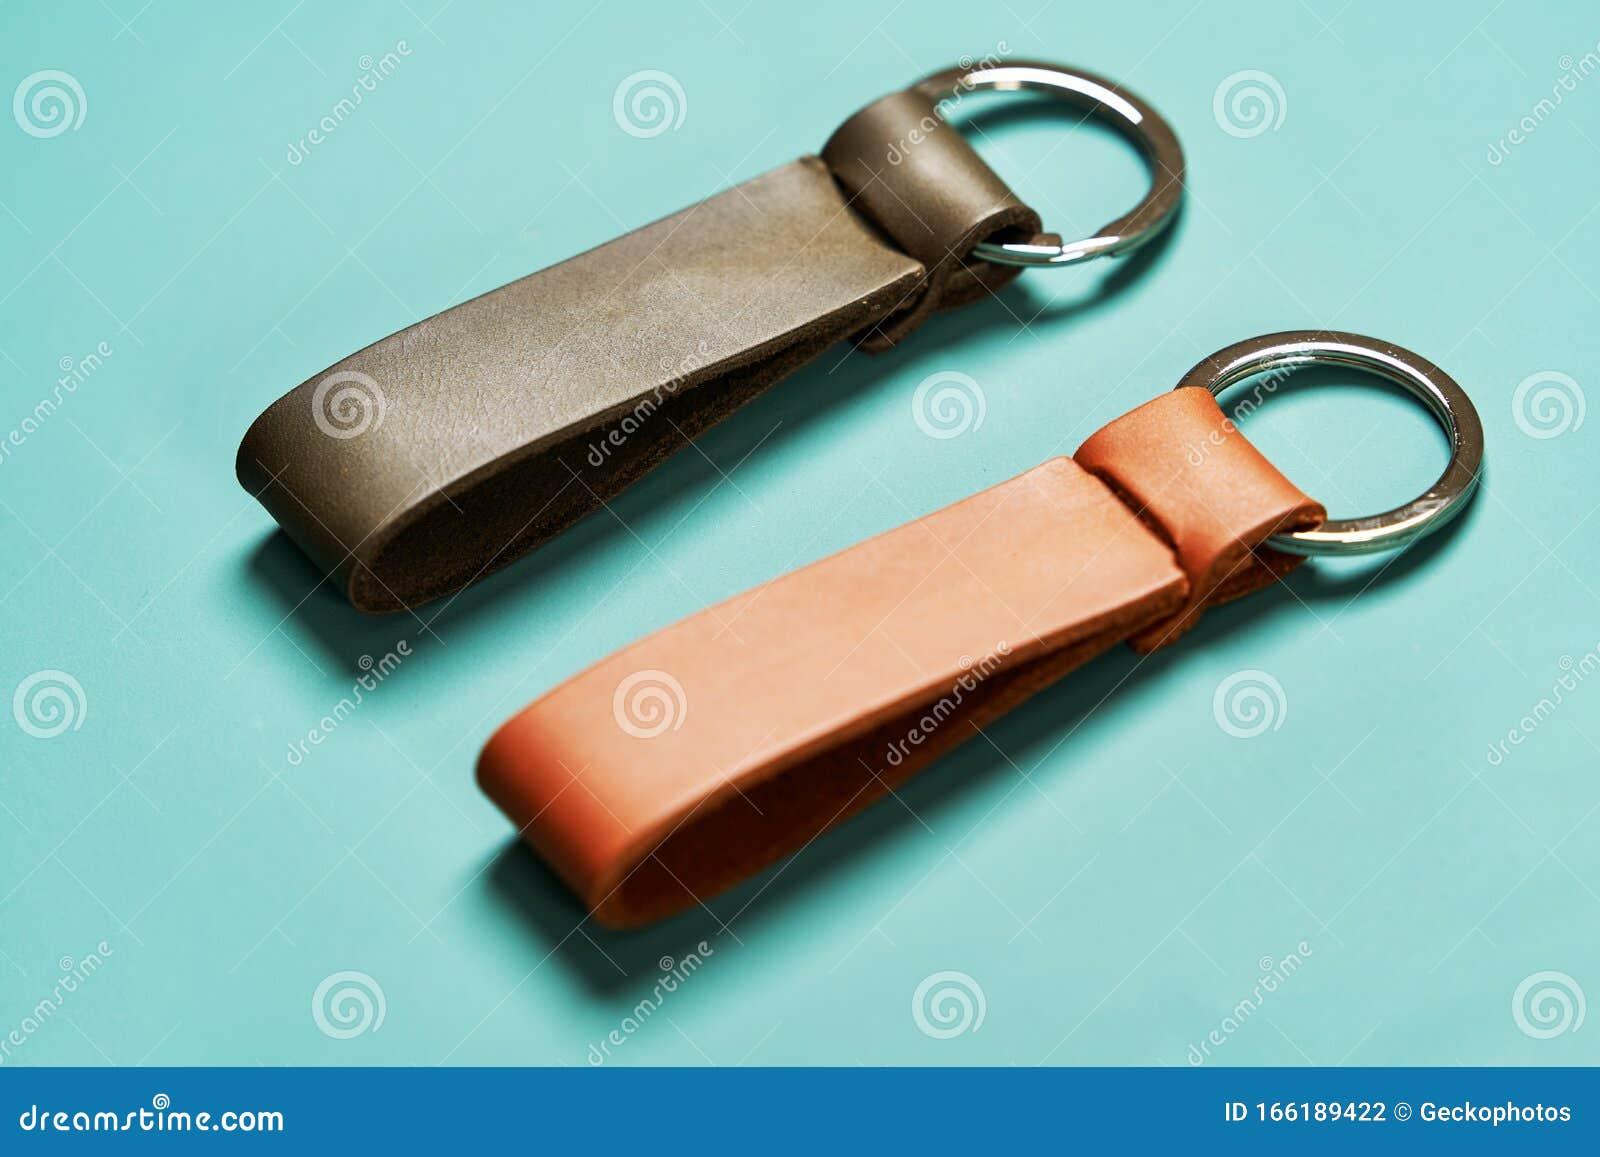 handmade blue key chain handmade leather accessories. leather key fob leather key ring Leather key chain